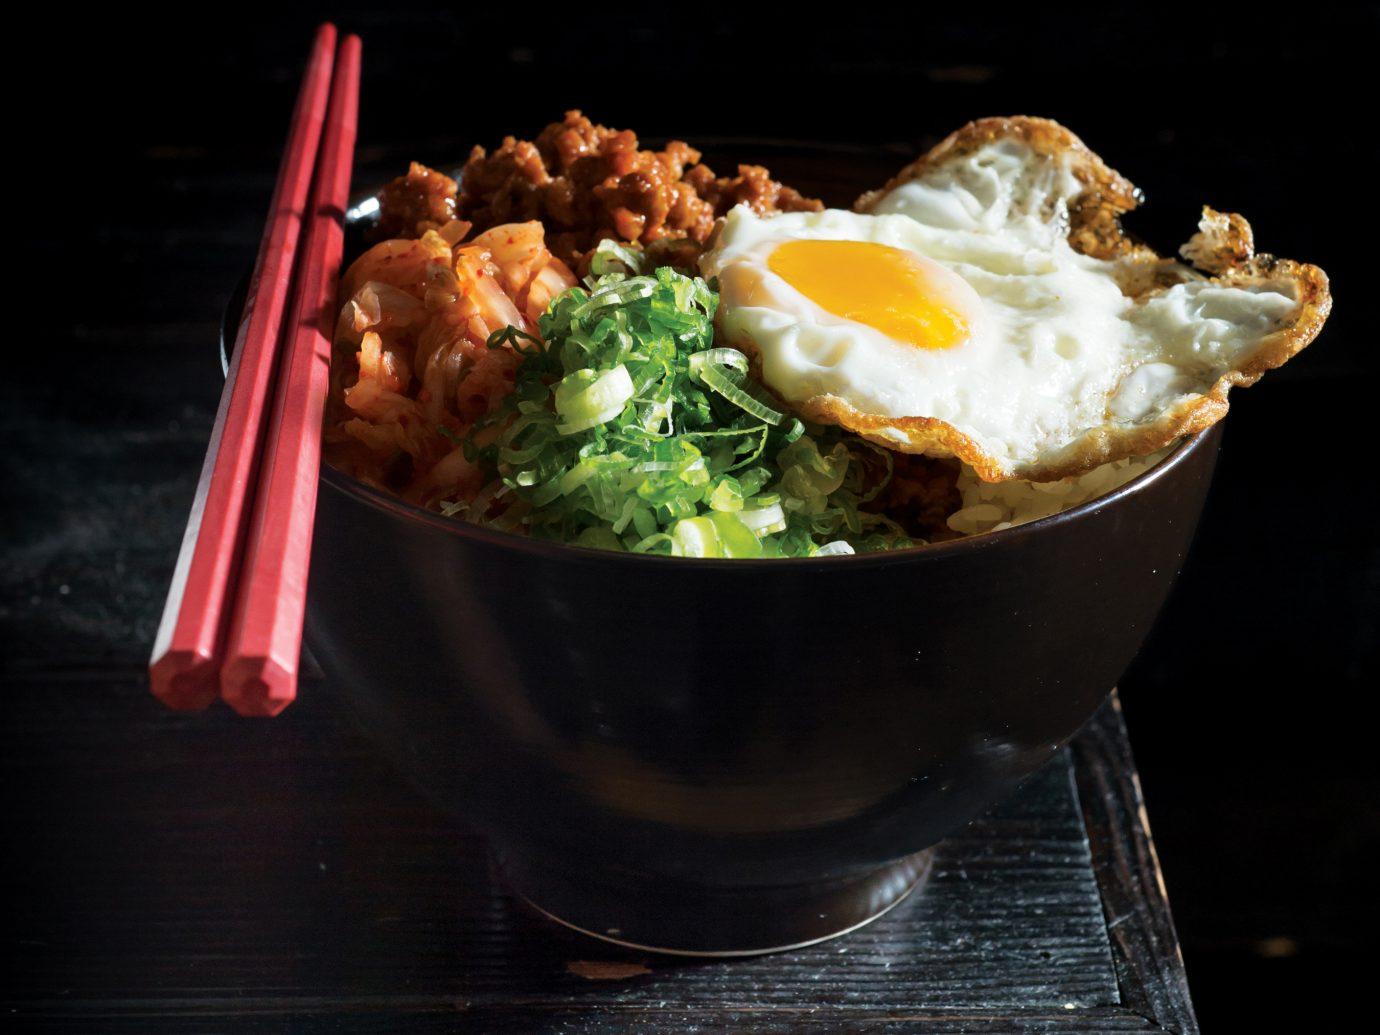 Food + Drink food dish meal cuisine produce asian food breakfast